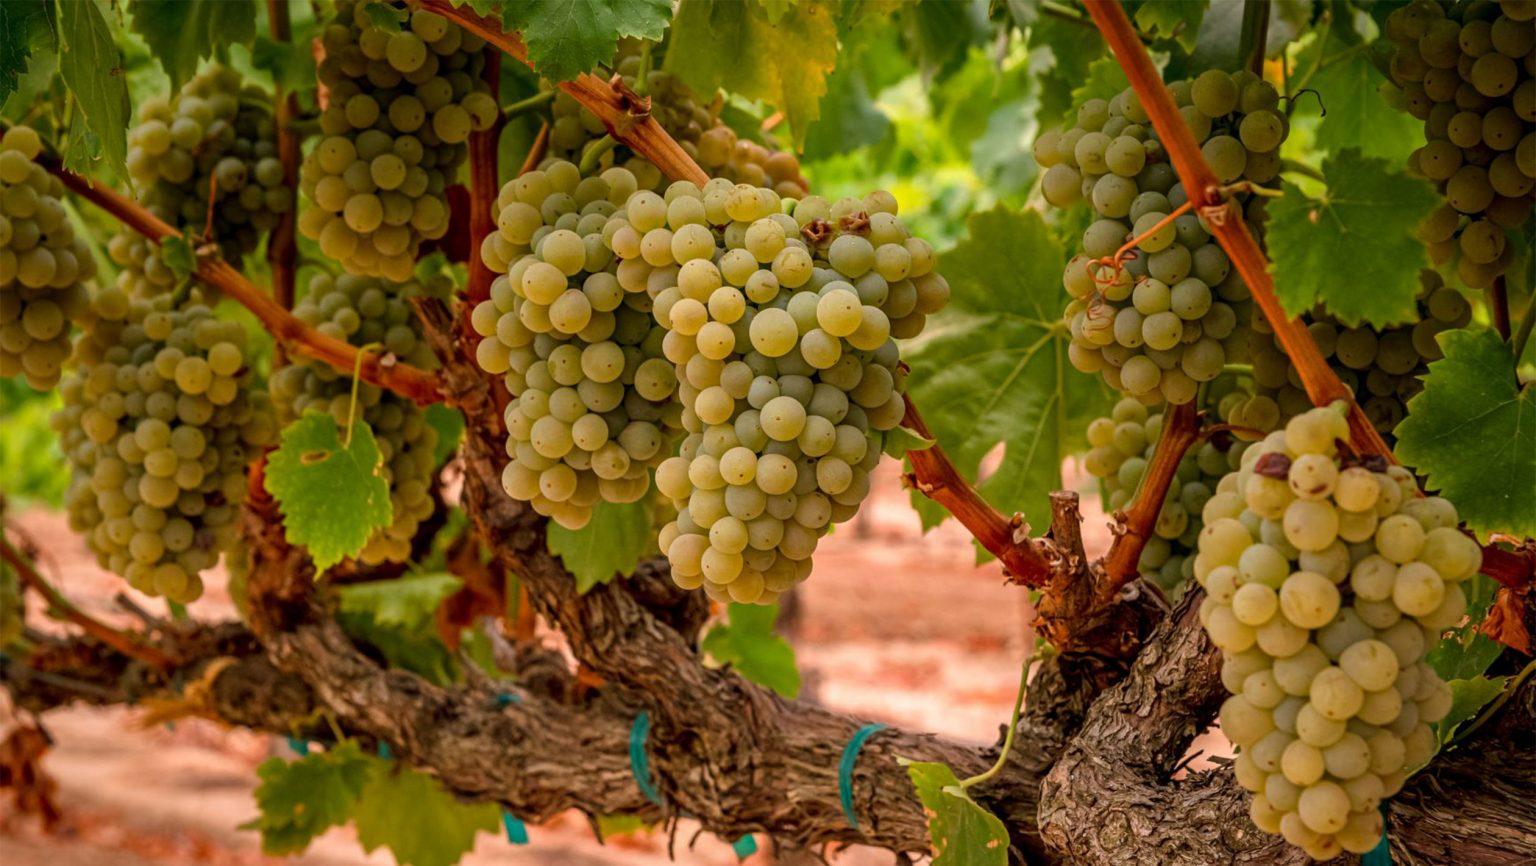 SFD_Picpoul_Harvest_CO_Acquiesce-Winery_Hero_2_2520x1420-1536x866